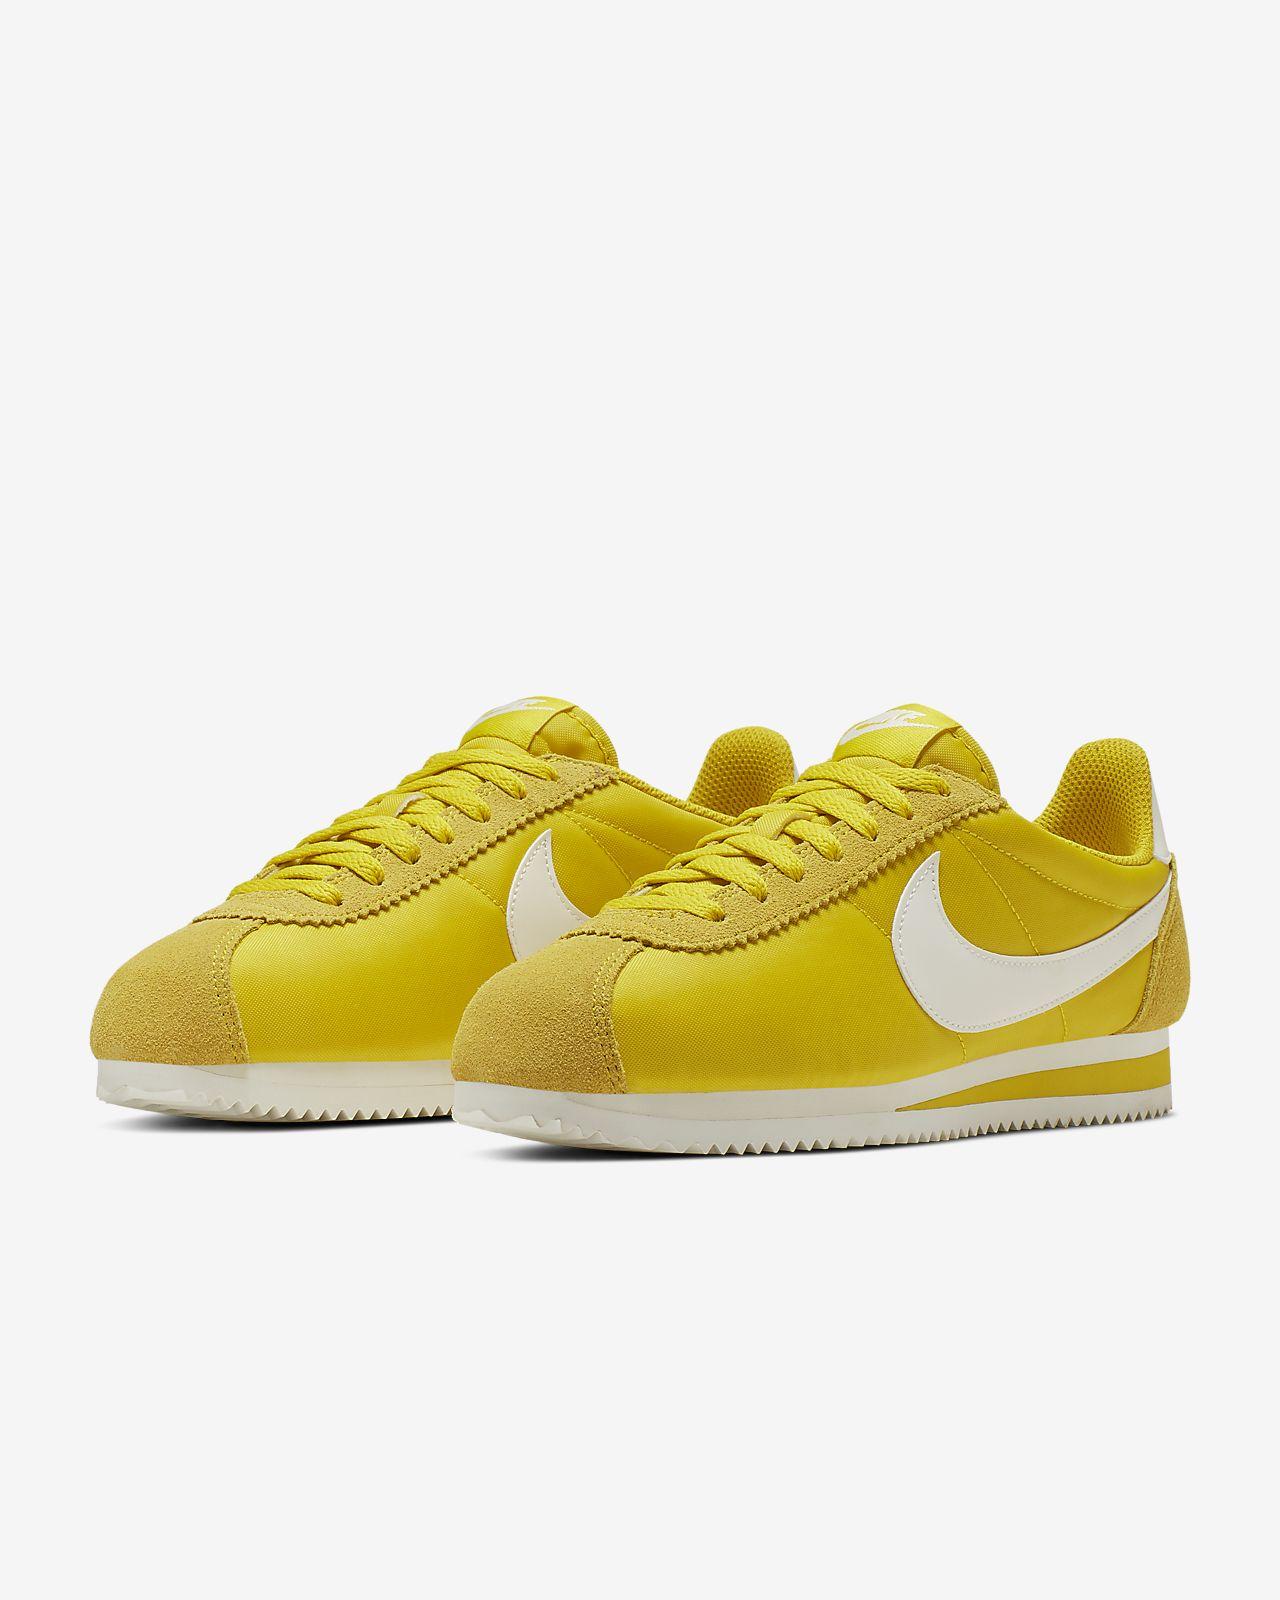 timeless design f3a52 72745 ... Chaussure Nike Classic Cortez Nylon pour Femme